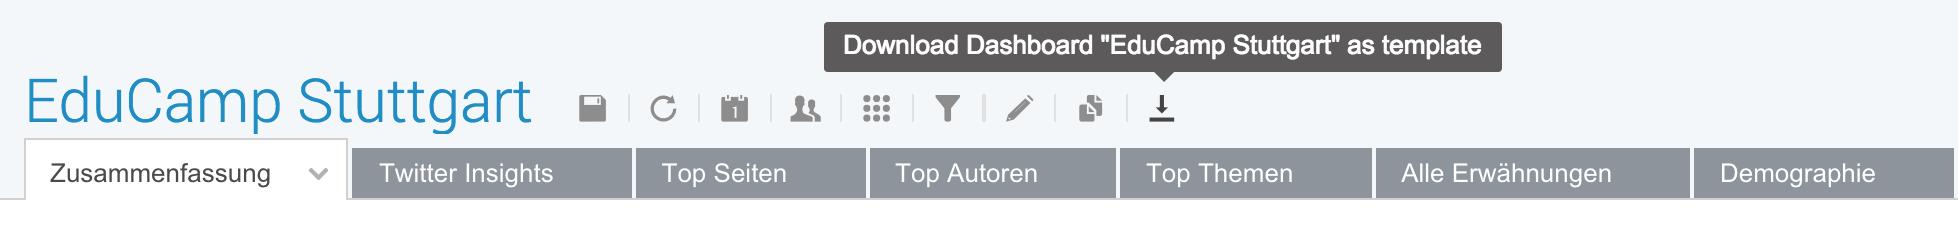 Lieblings-Feature: Dashboard Templates | Brandwatch